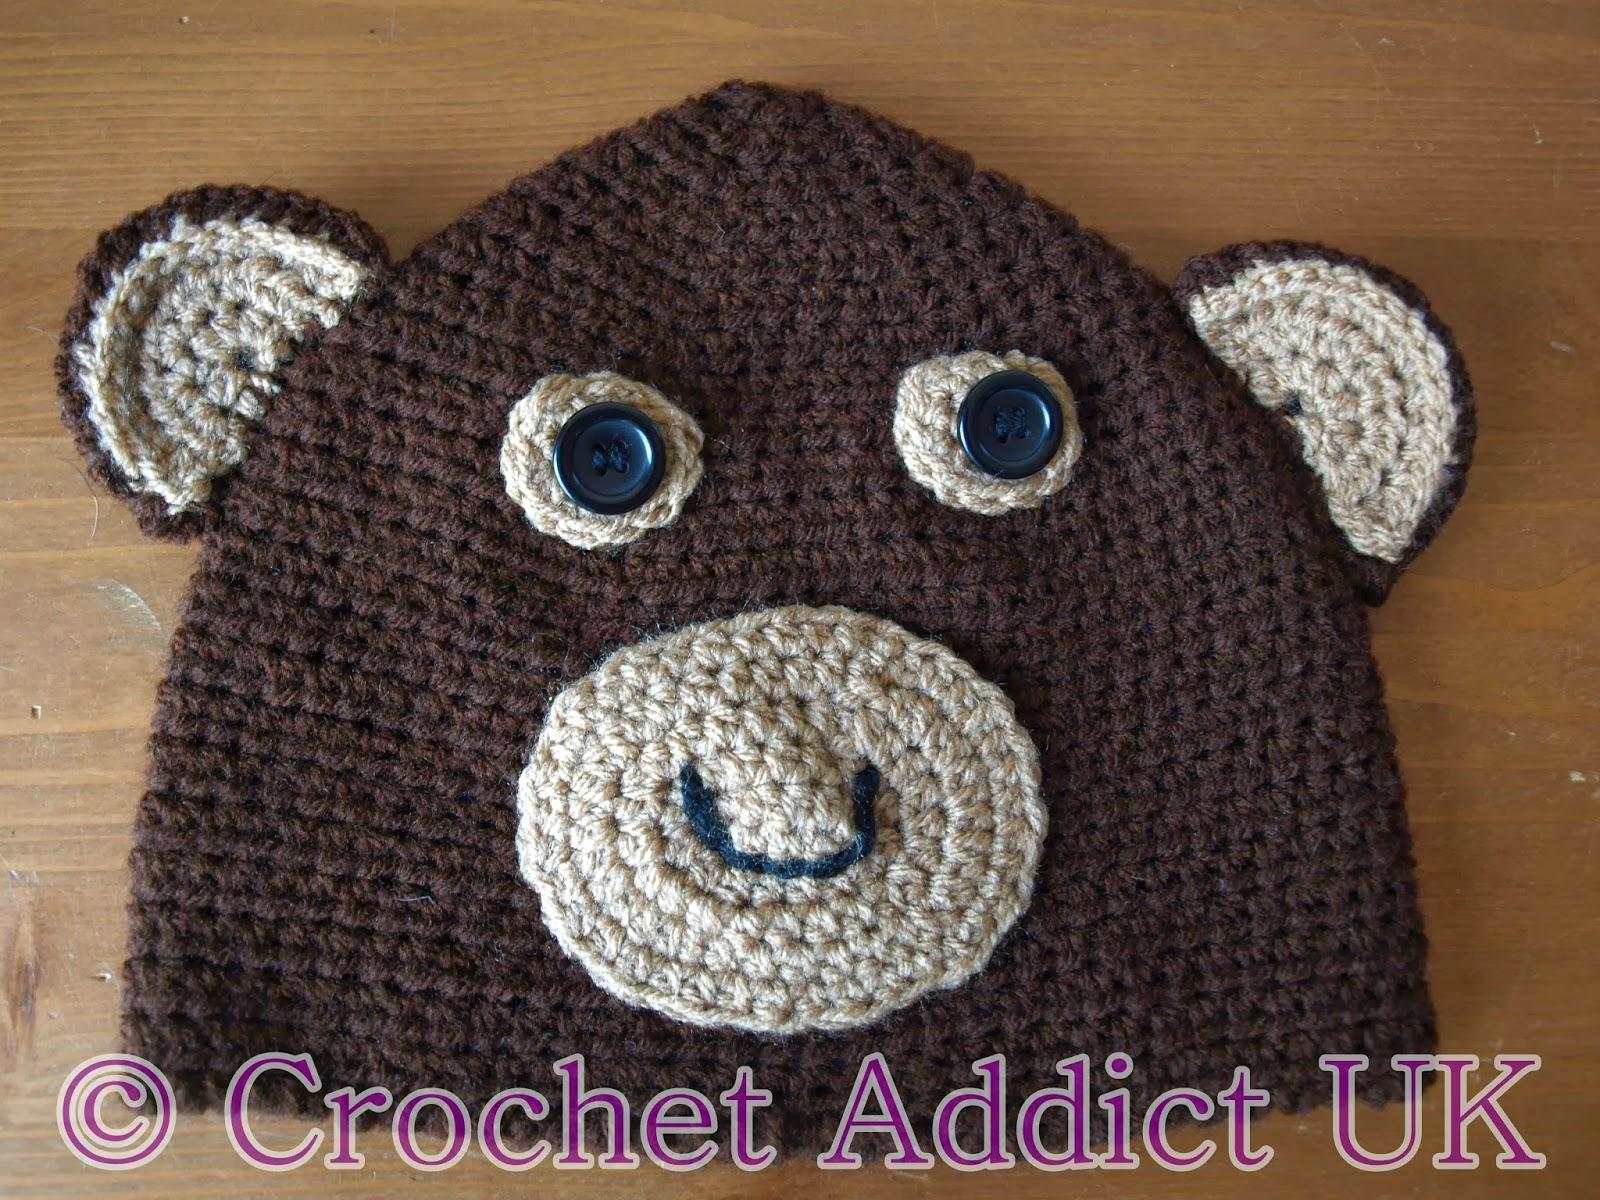 Monkey beanie hat 1 yr free crochet pattern crochet addict uk monkey beanie hat 1 yr free crochet pattern crochet addict uk bankloansurffo Images